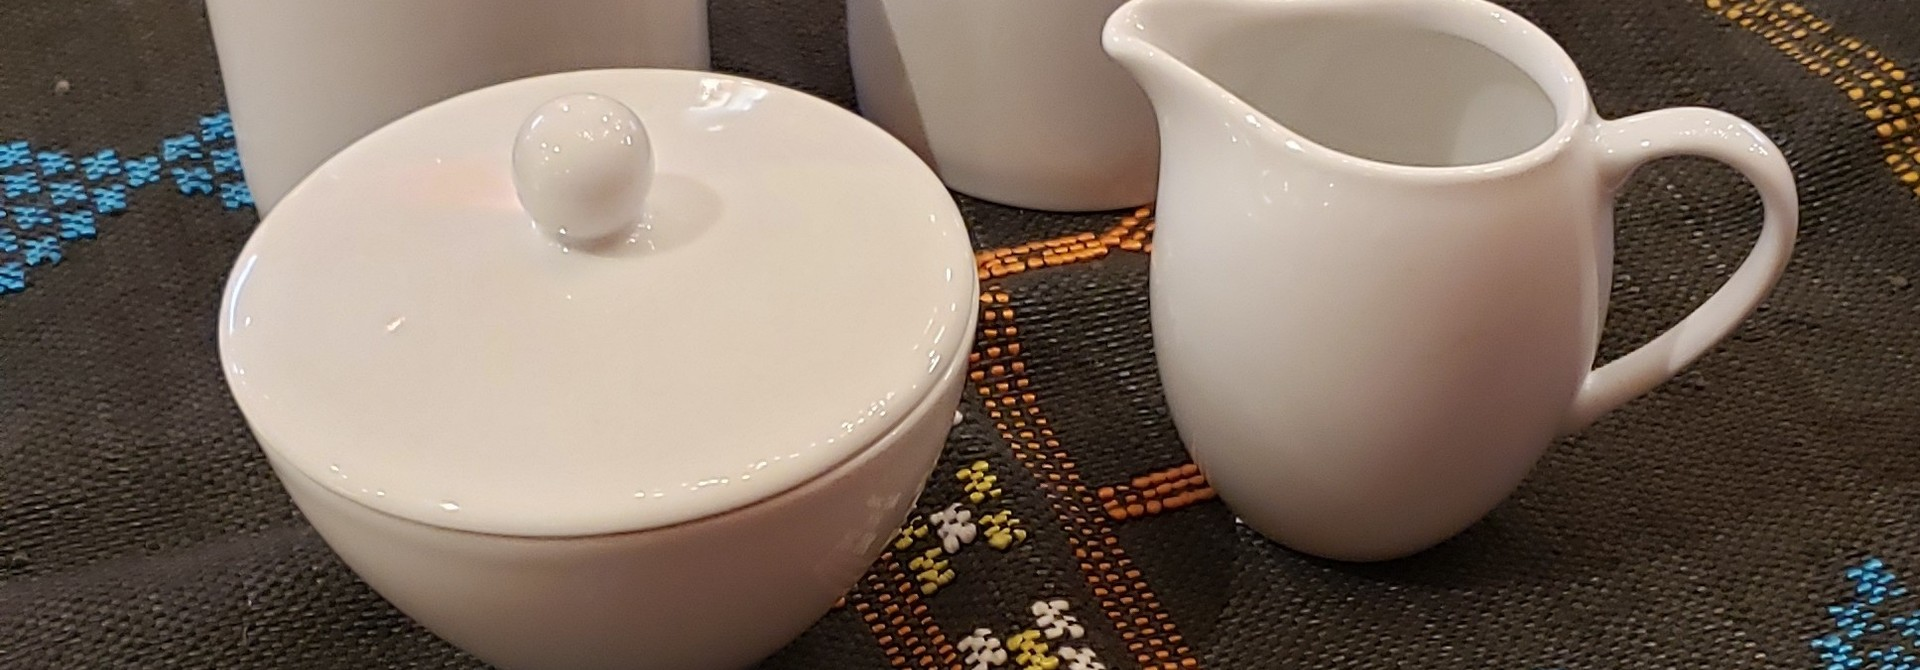 Sugar Bowl, creamer & 2 mugs